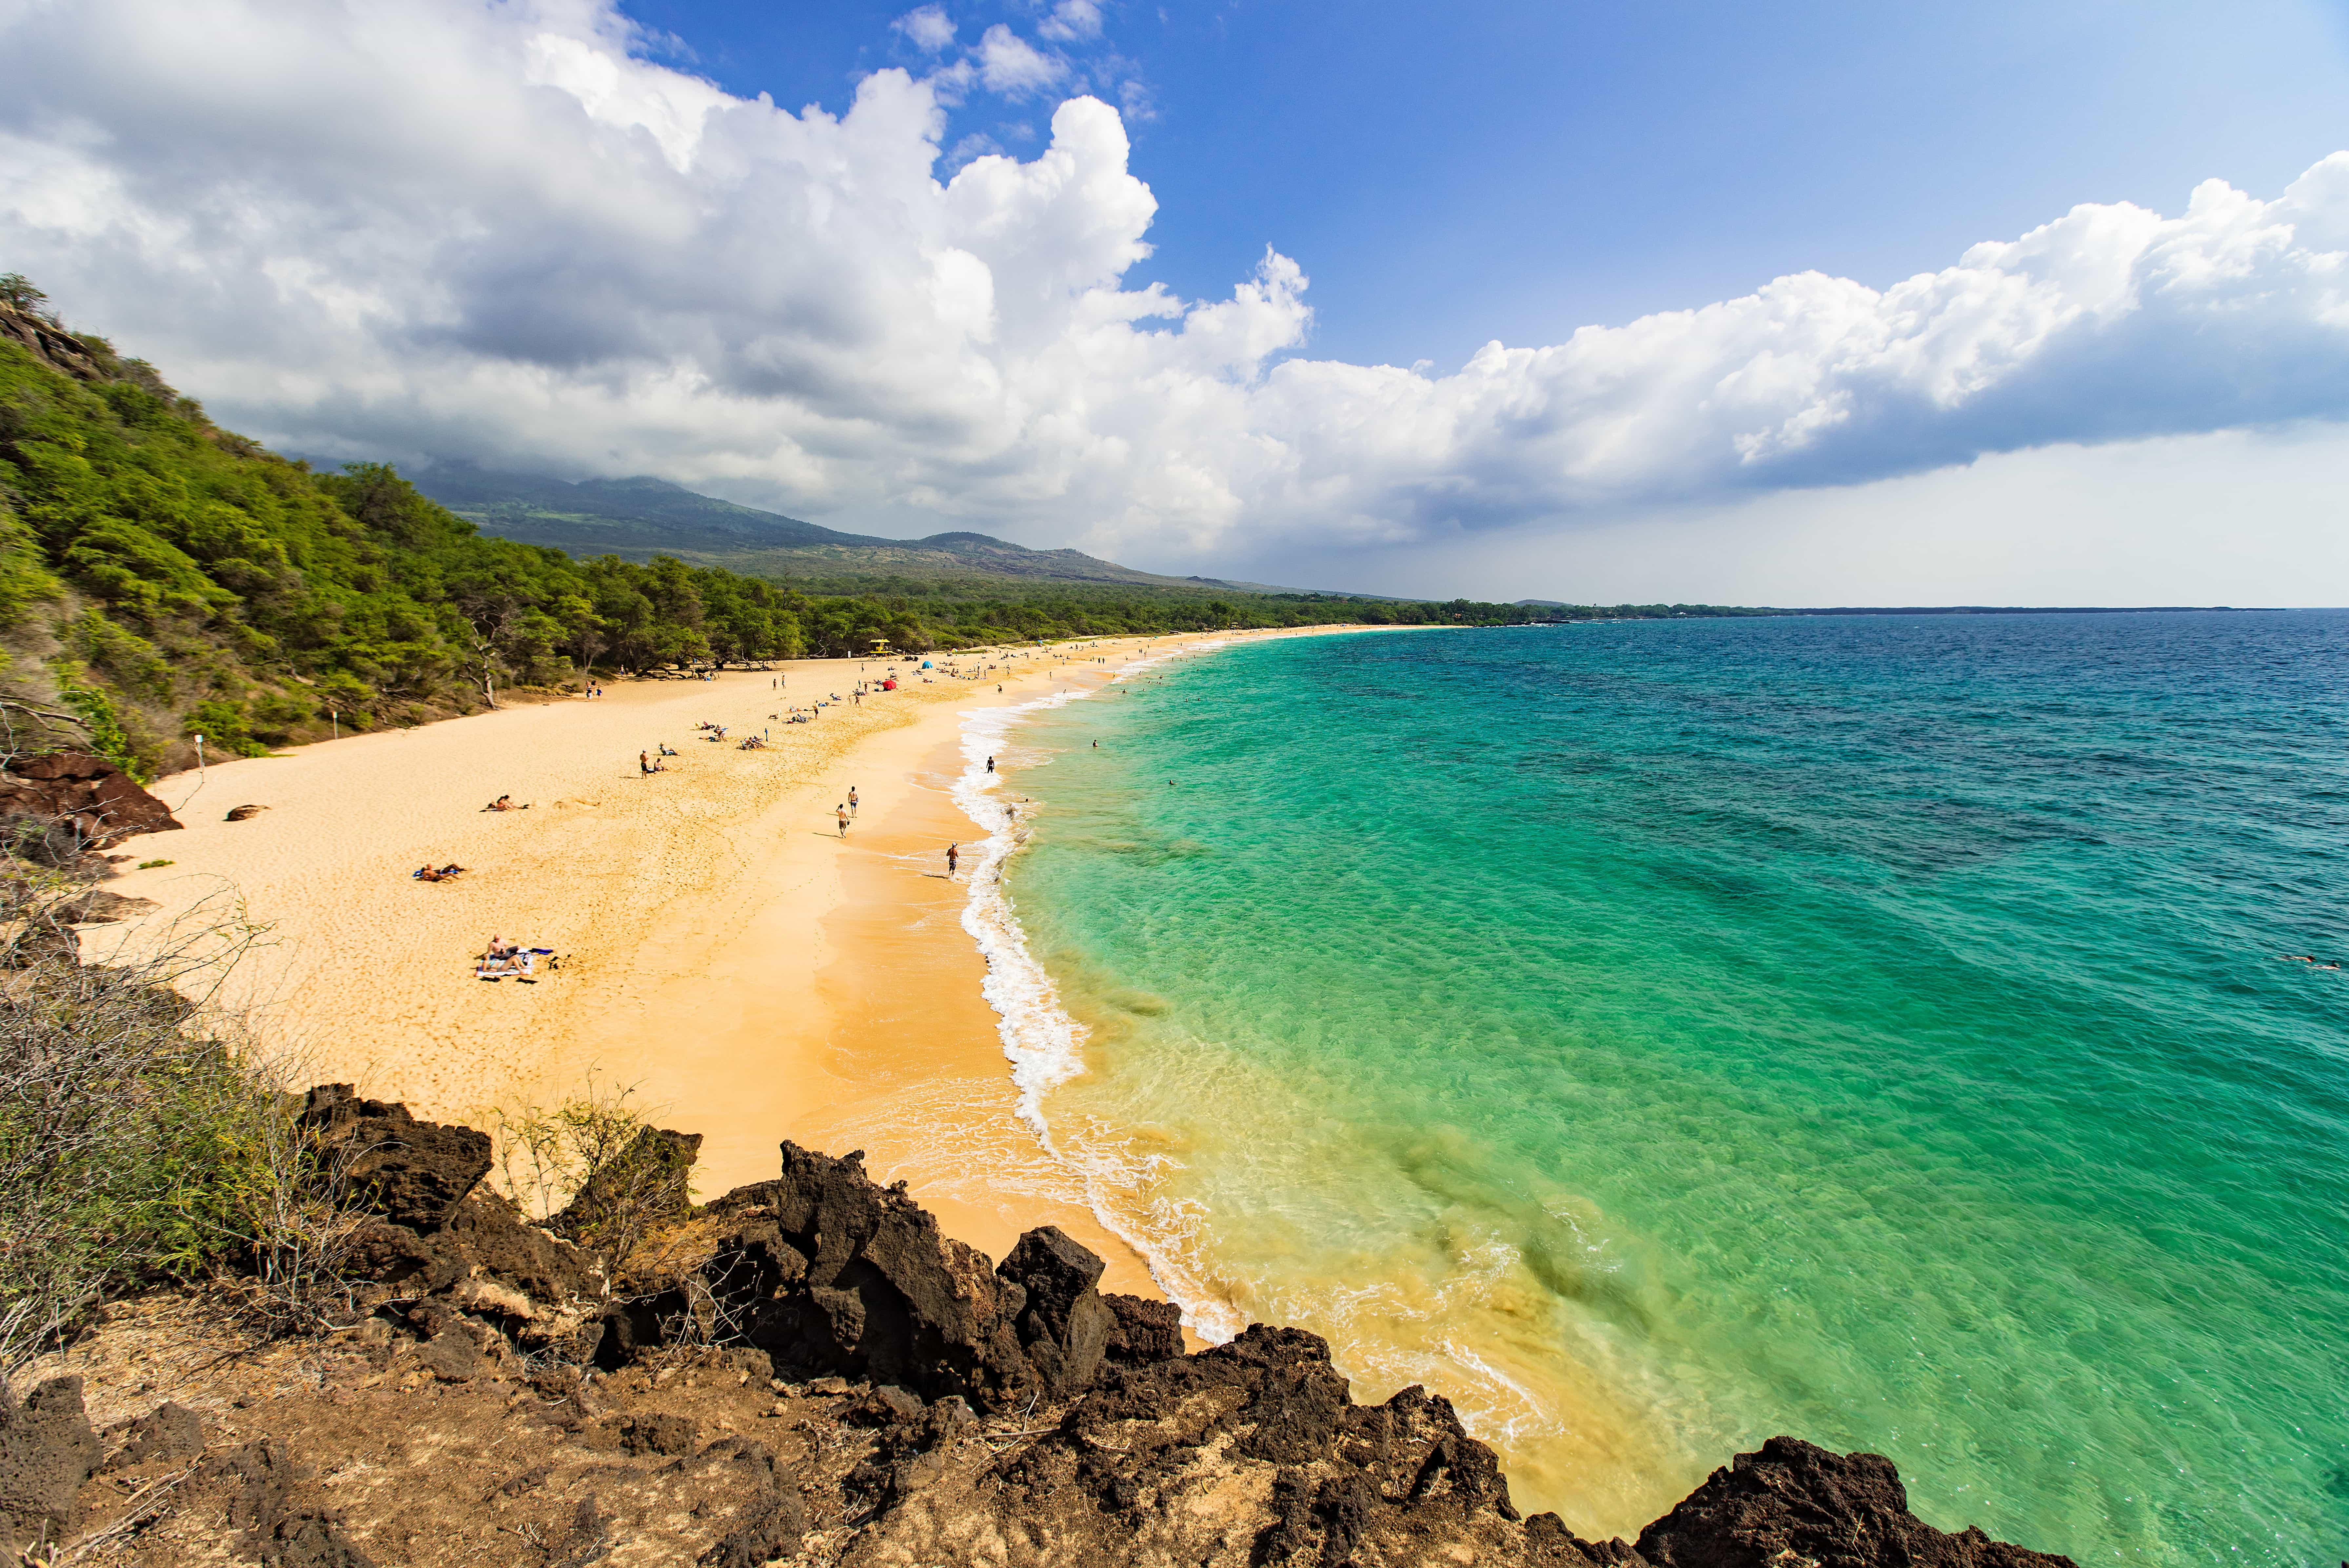 Maui Island in Hwaii